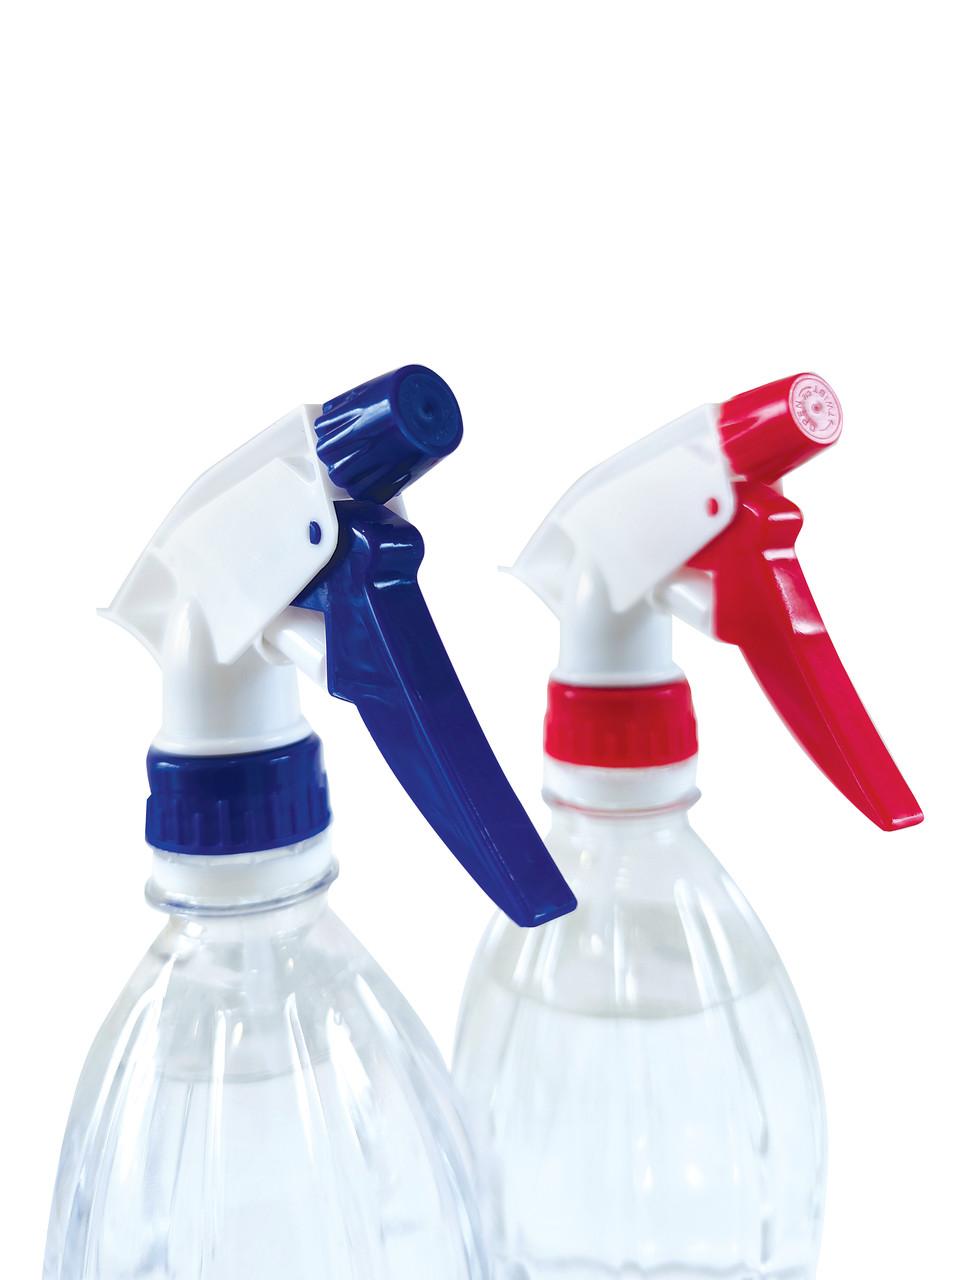 Распылитель для антисептика на ПЭТ бутылку - брызгалка, спрей